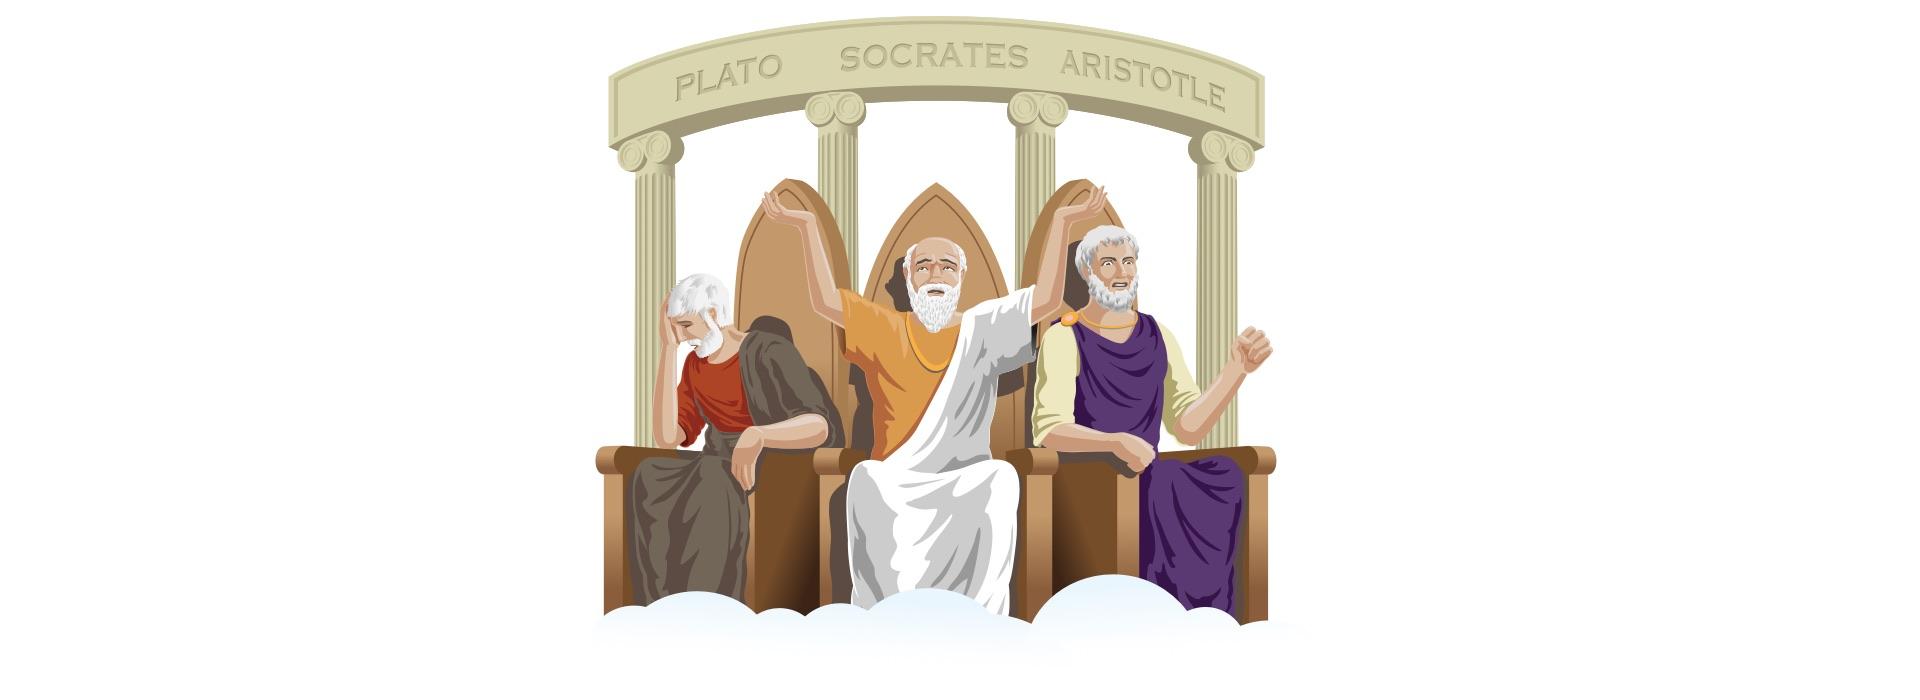 Link: Thou shalt not commit logical fallacies